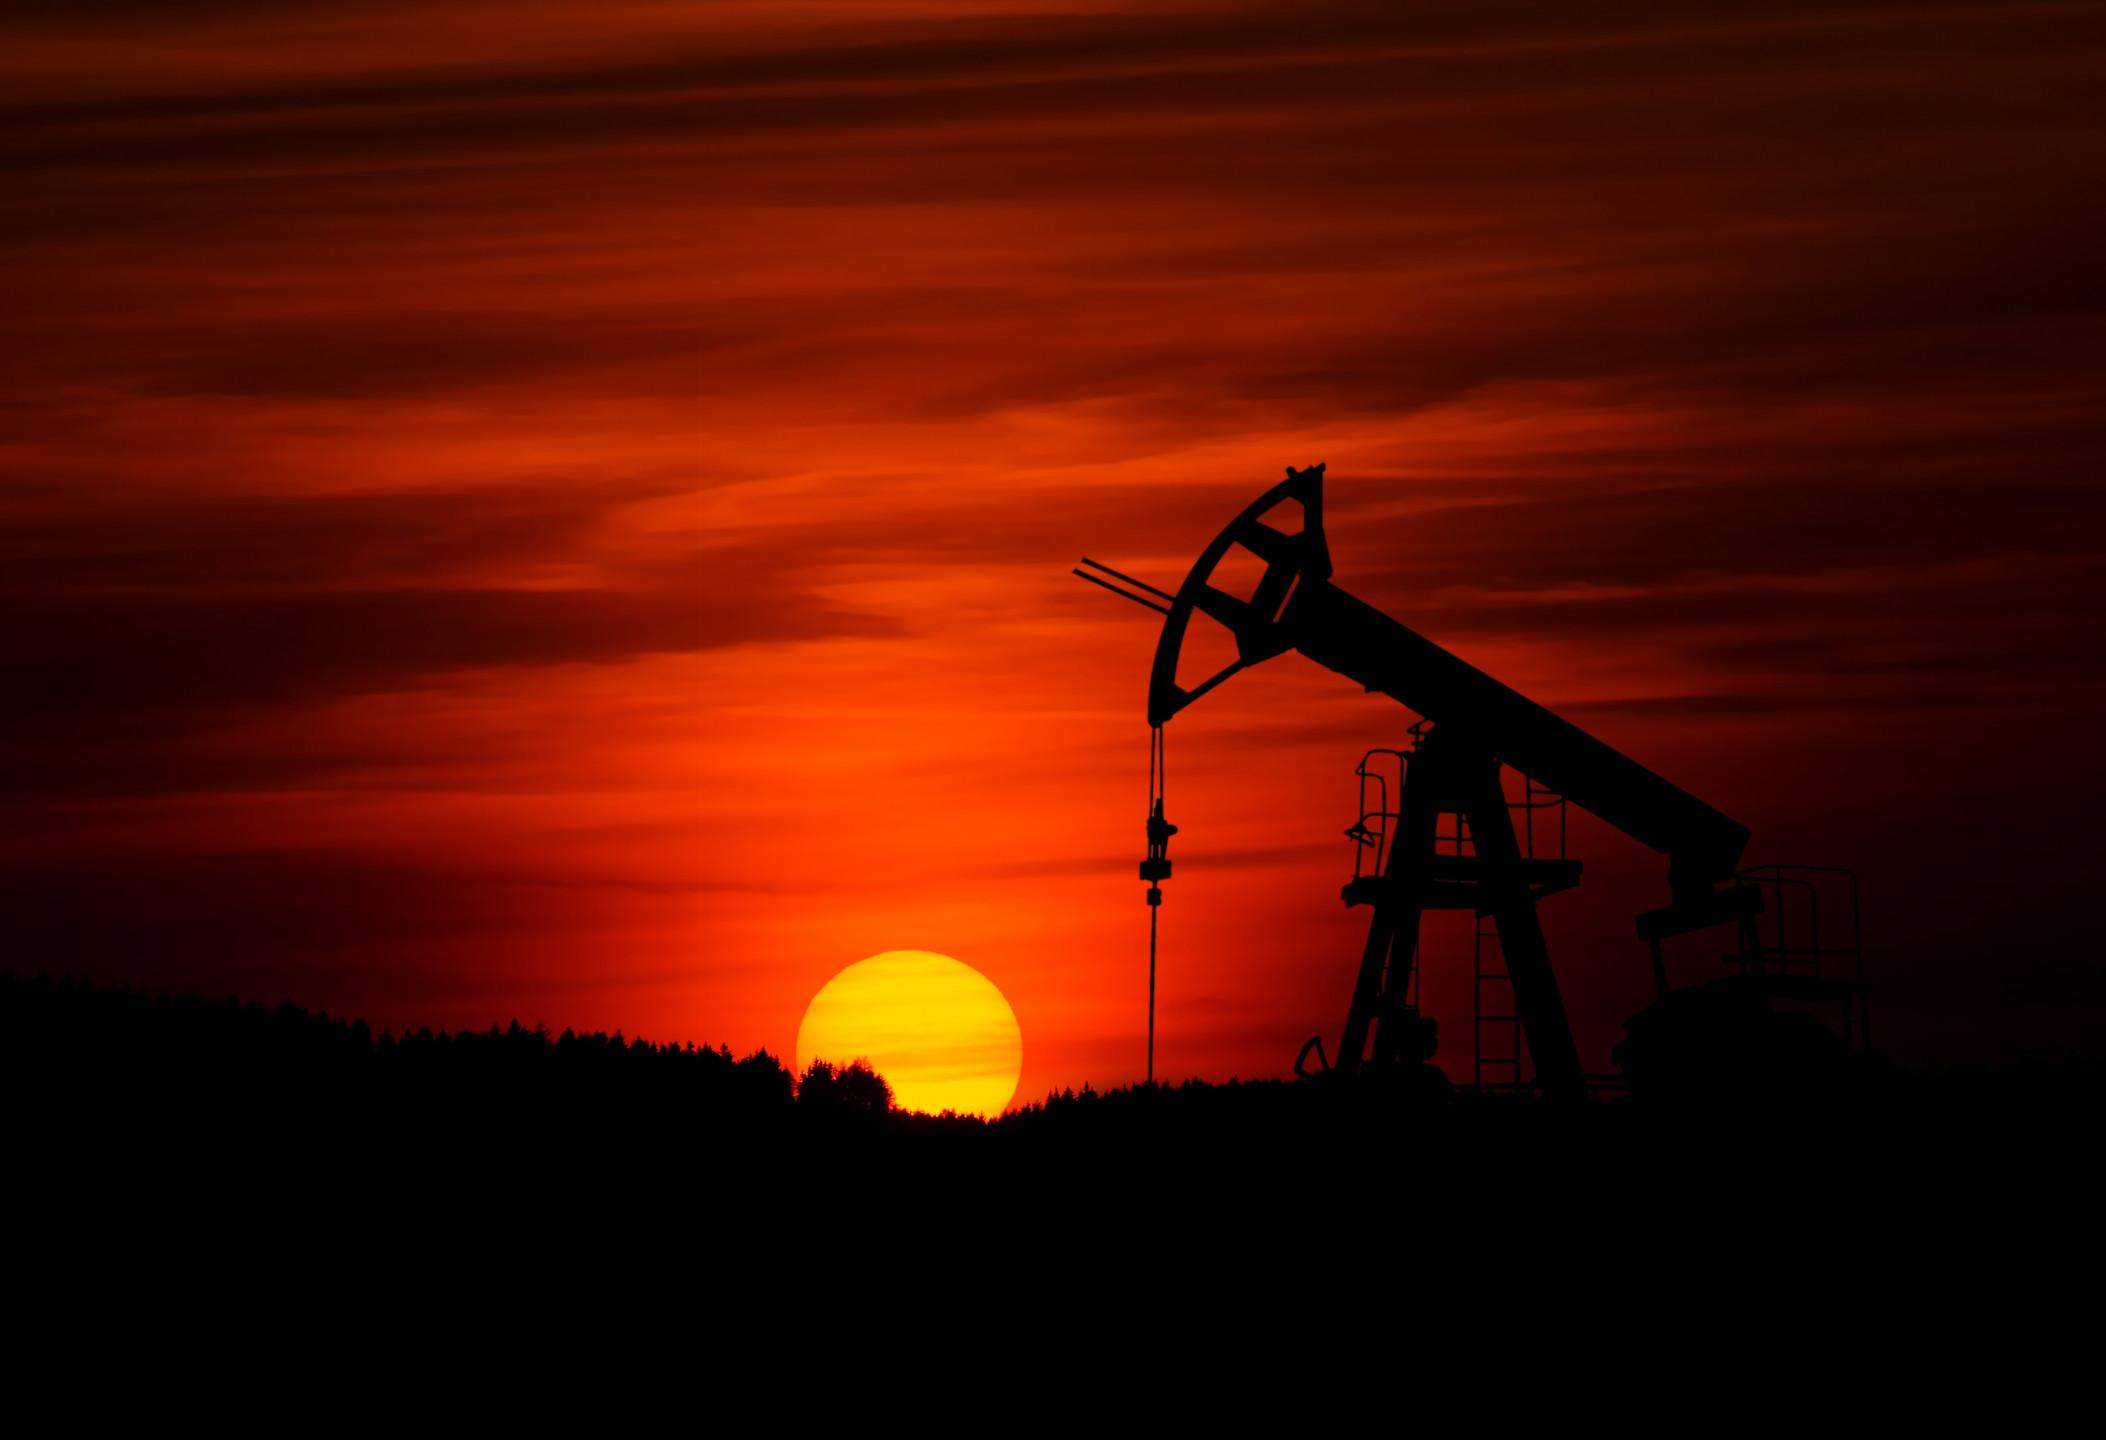 Crude oil price declines to $62 as Trump pressures OPEC